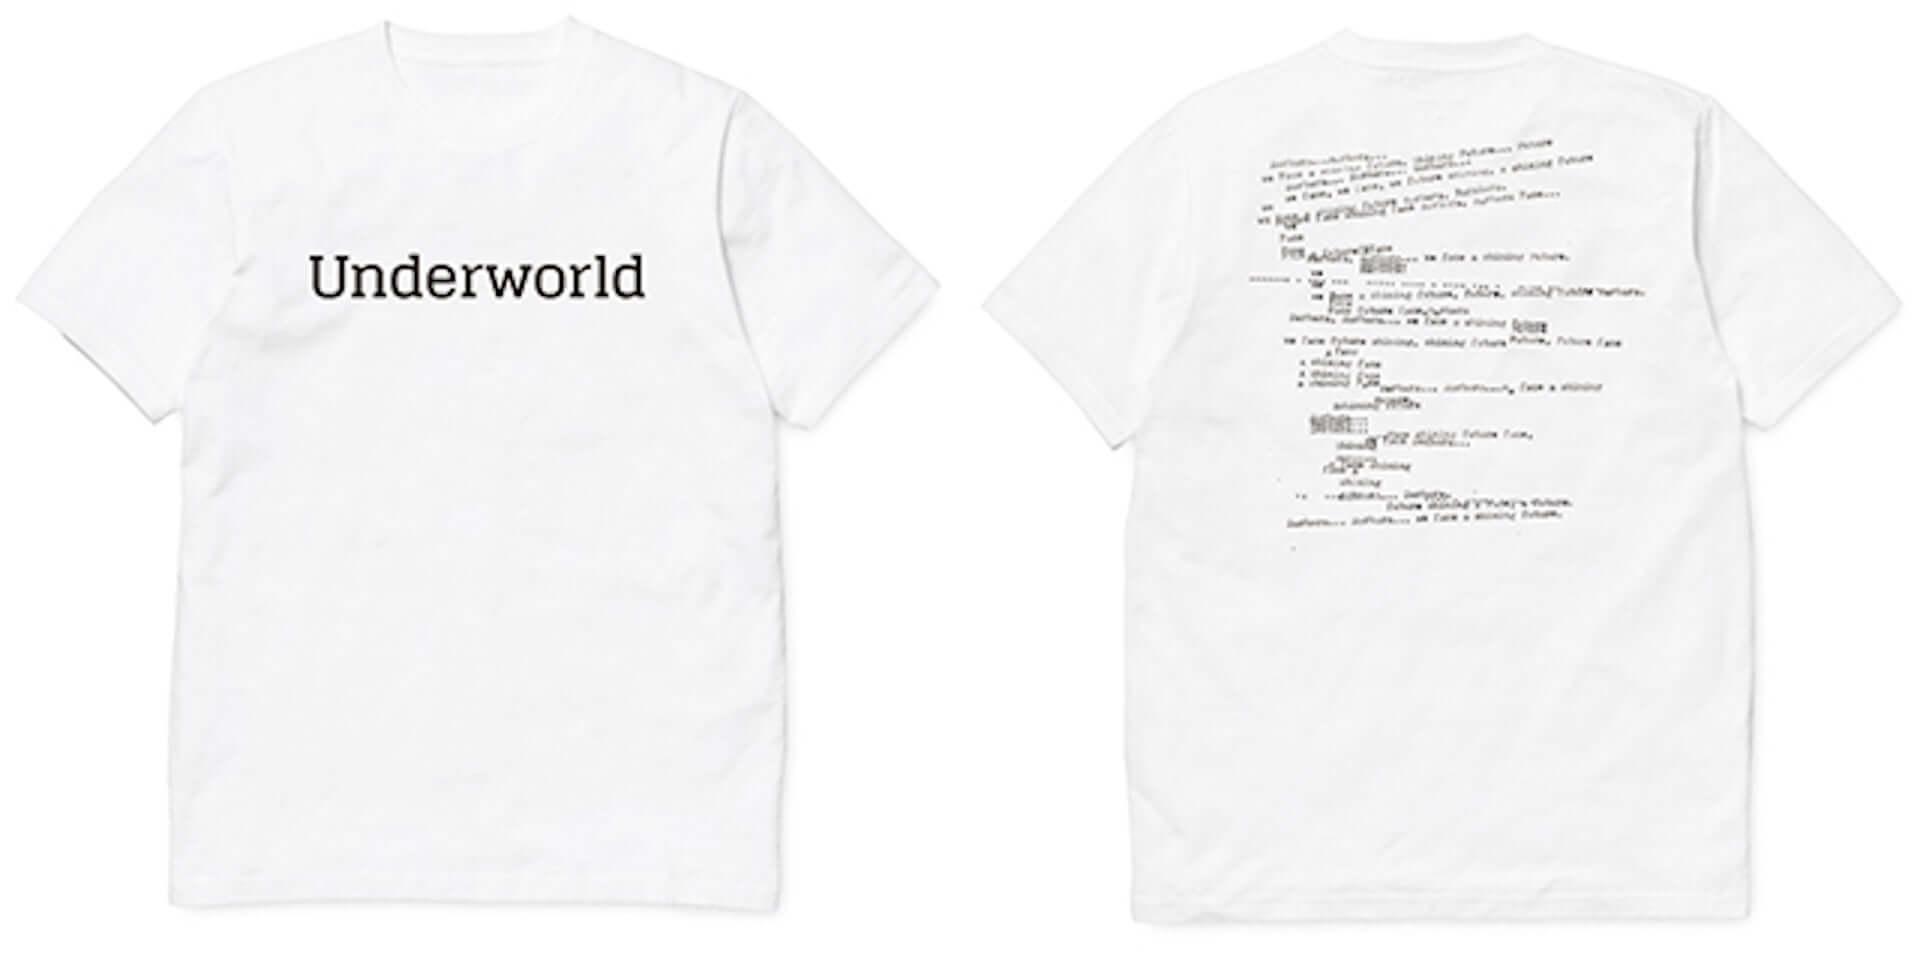 Underworldの伝説のステージ<SUMMER SONIC 2016>の記録映像が明日配信!当時のライブレポートが公開&公式Tシャツが復刻決定 music200626_underworld_10-1920x960